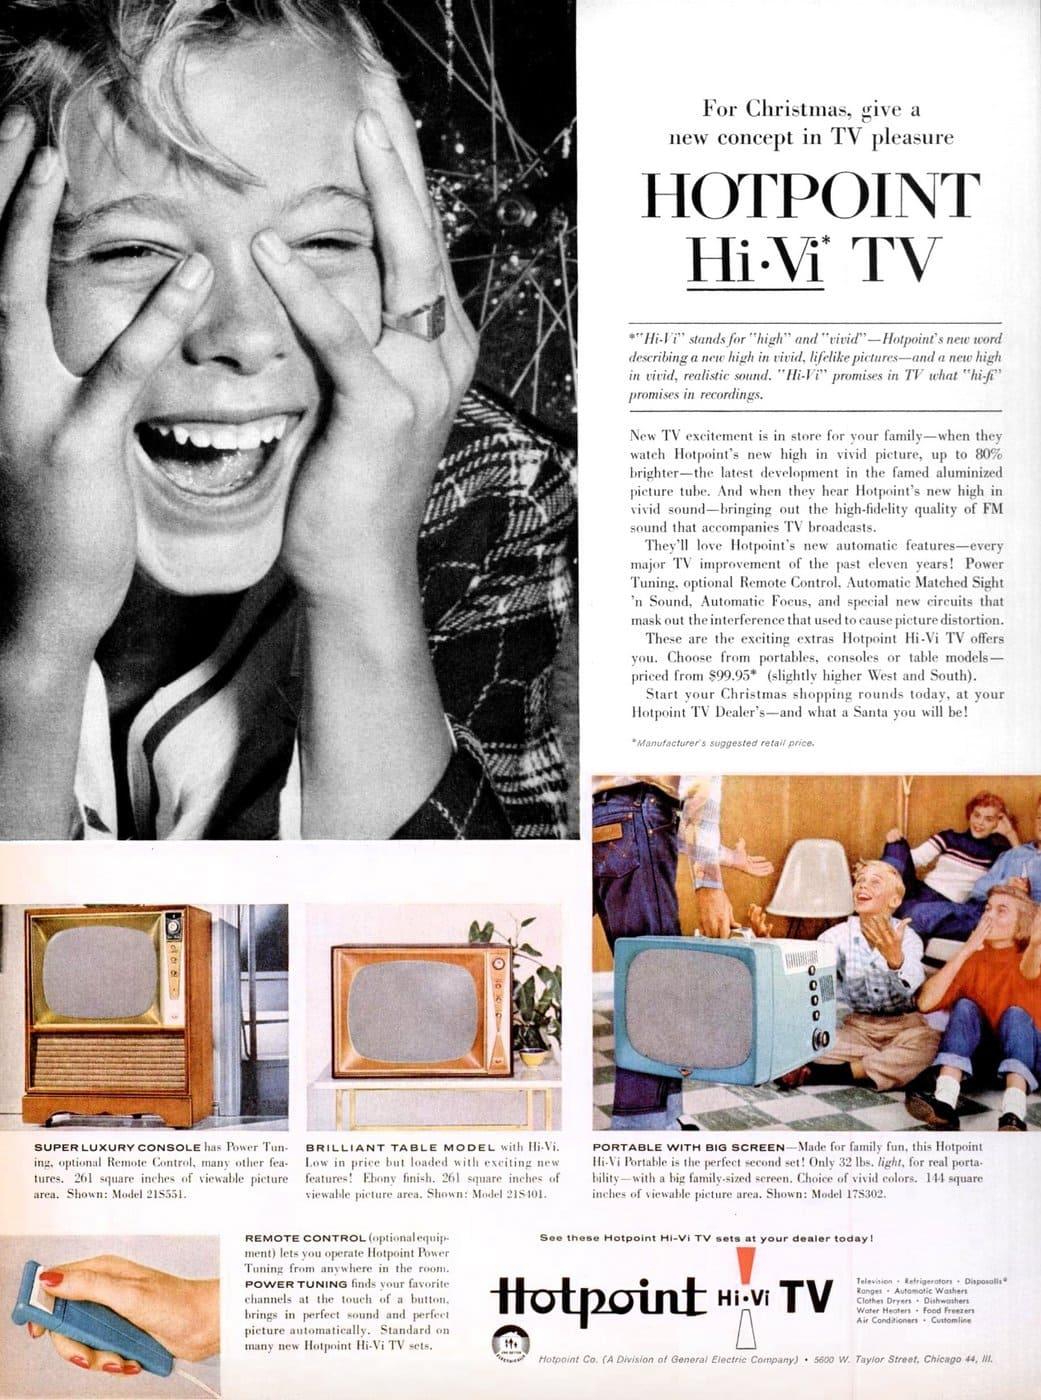 1956 Hotpoint Hi-Vi TV